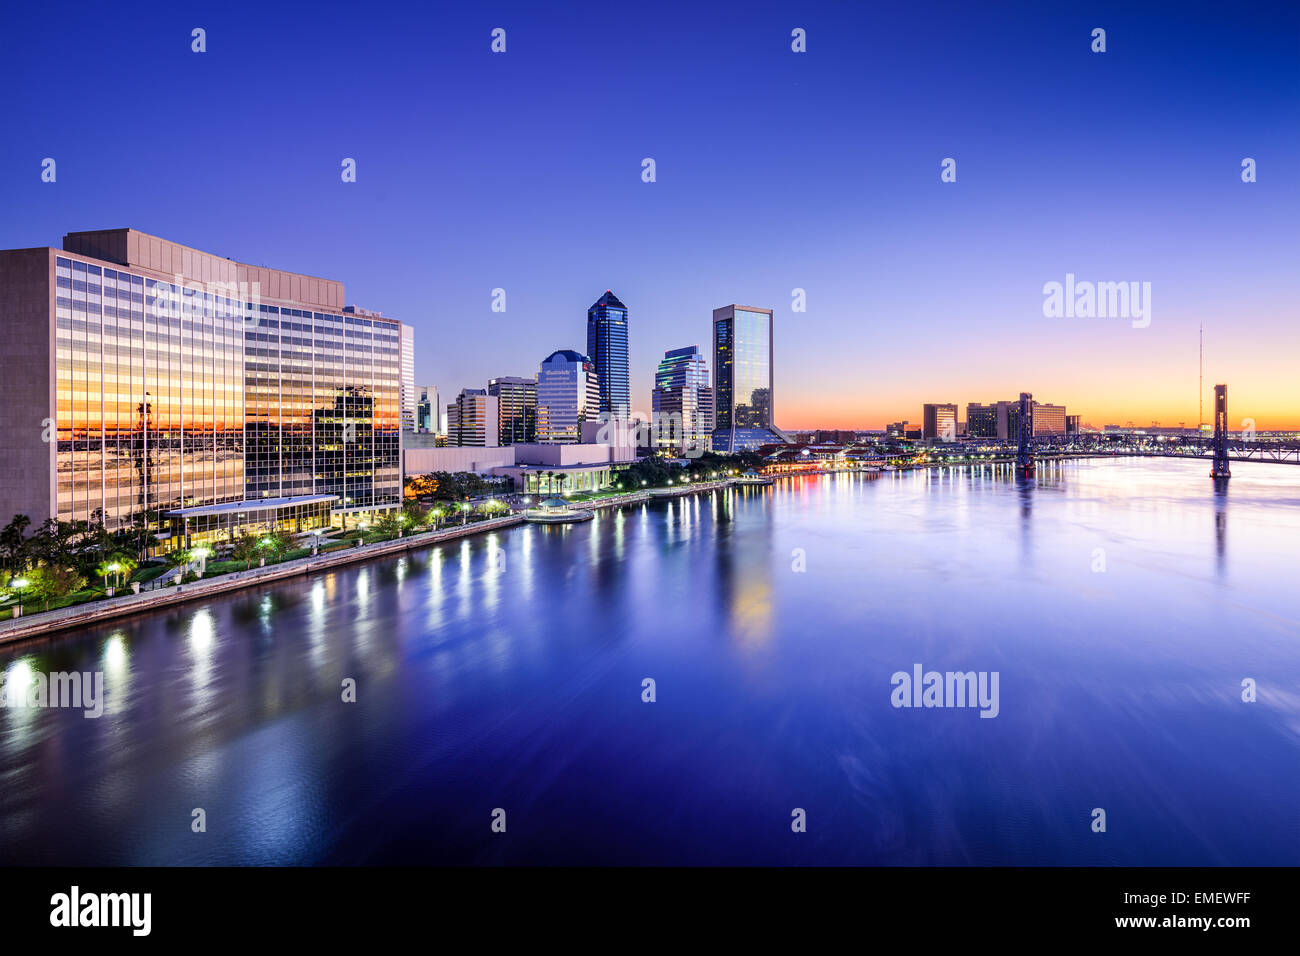 Jacksonville, Florida, USA downtown skyline on St. Johns River. - Stock Image